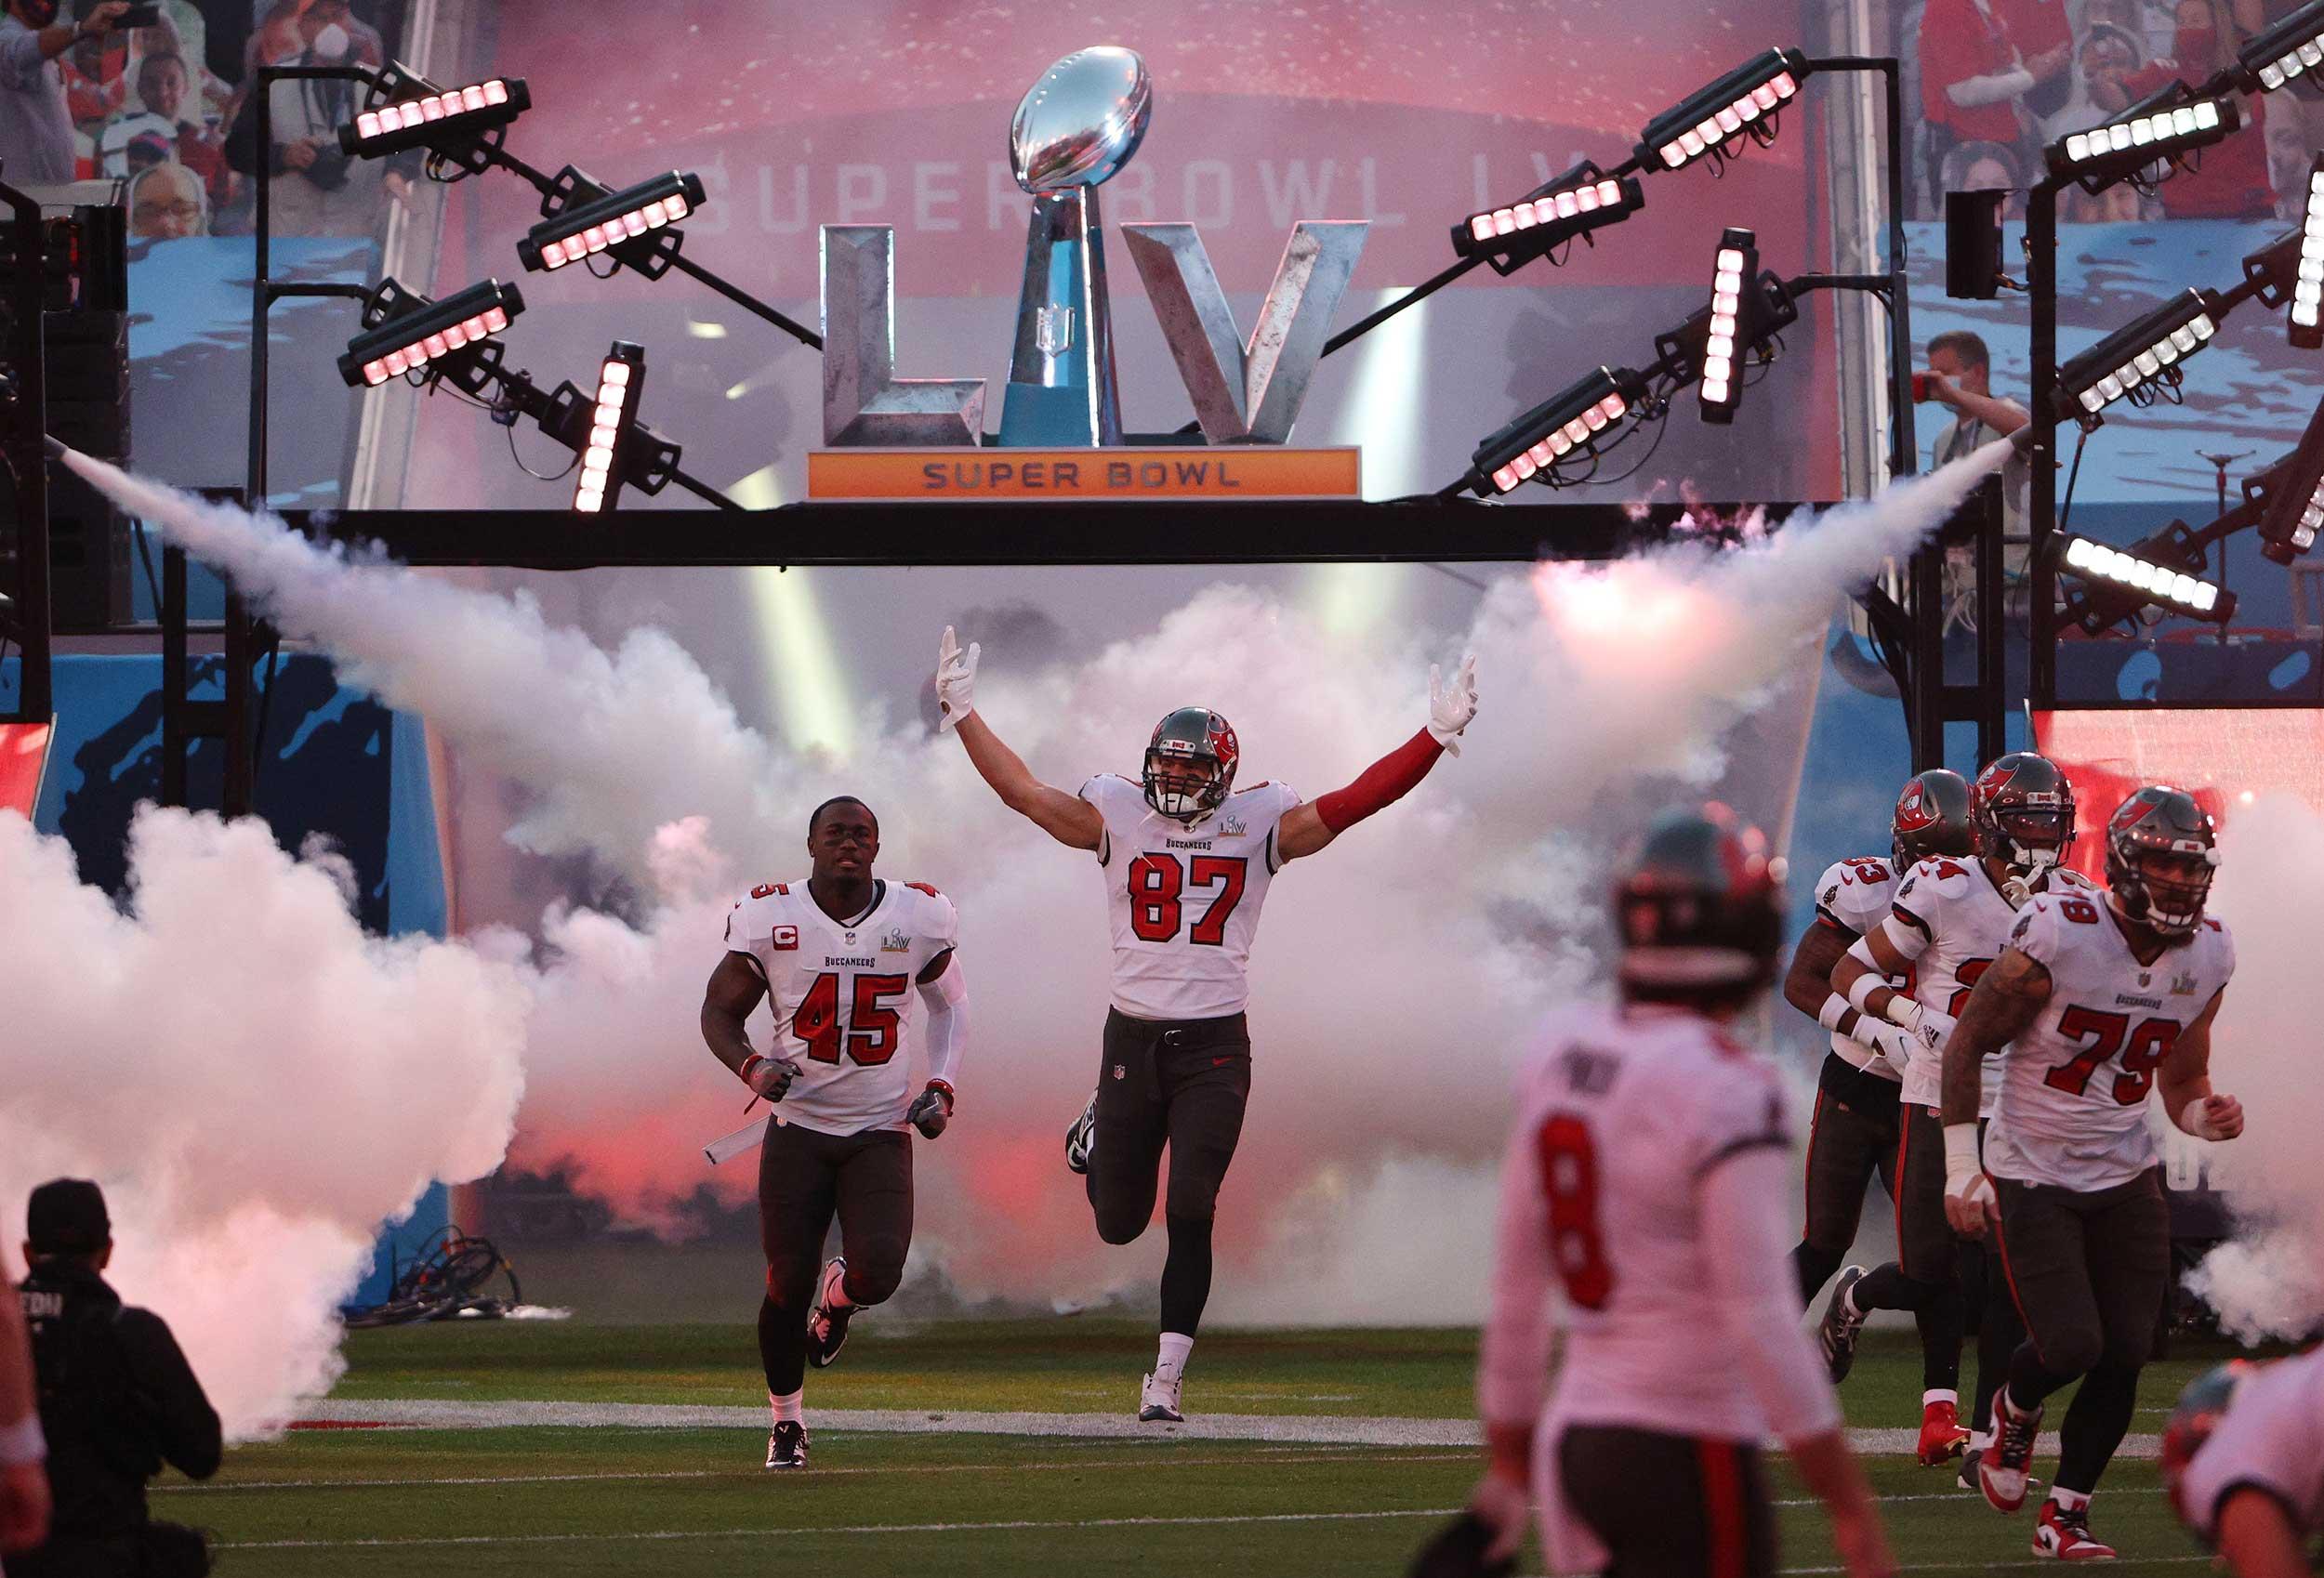 Super Bowl LV – Player Entrance